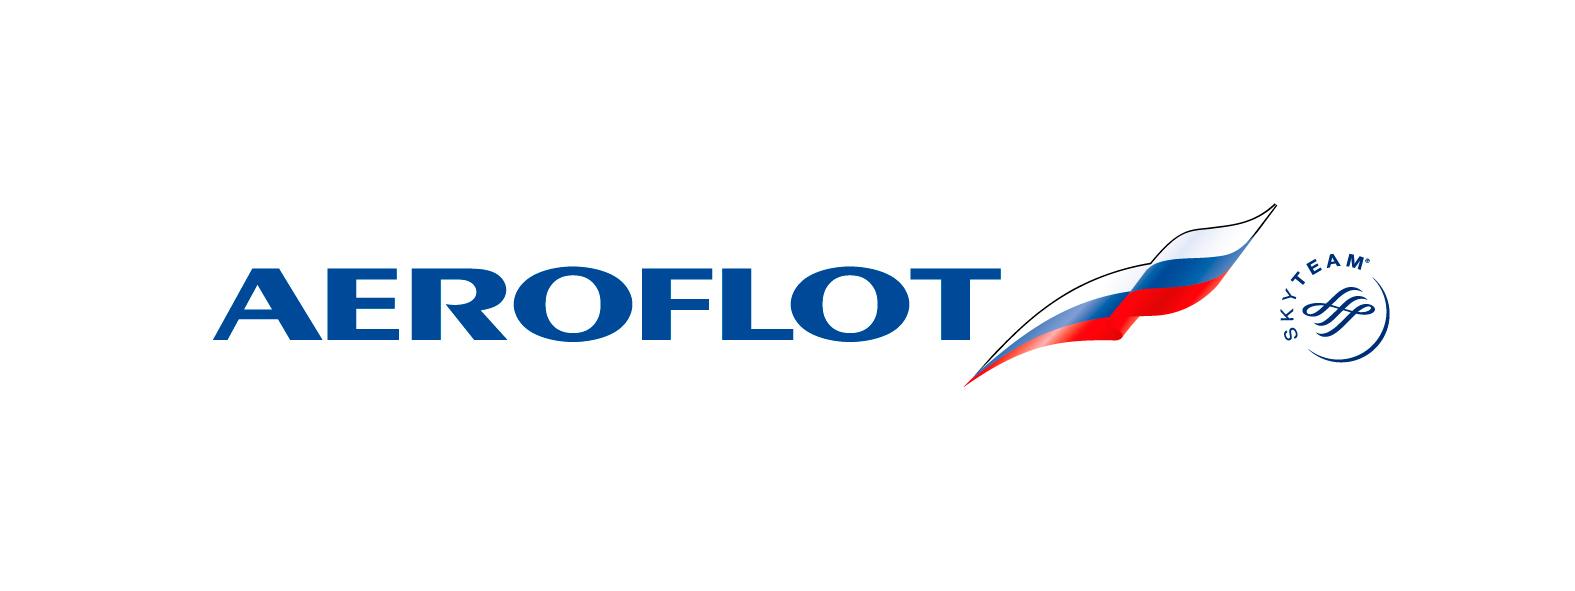 Download The Aeroflot Logo - Aeroflot Logo PNG